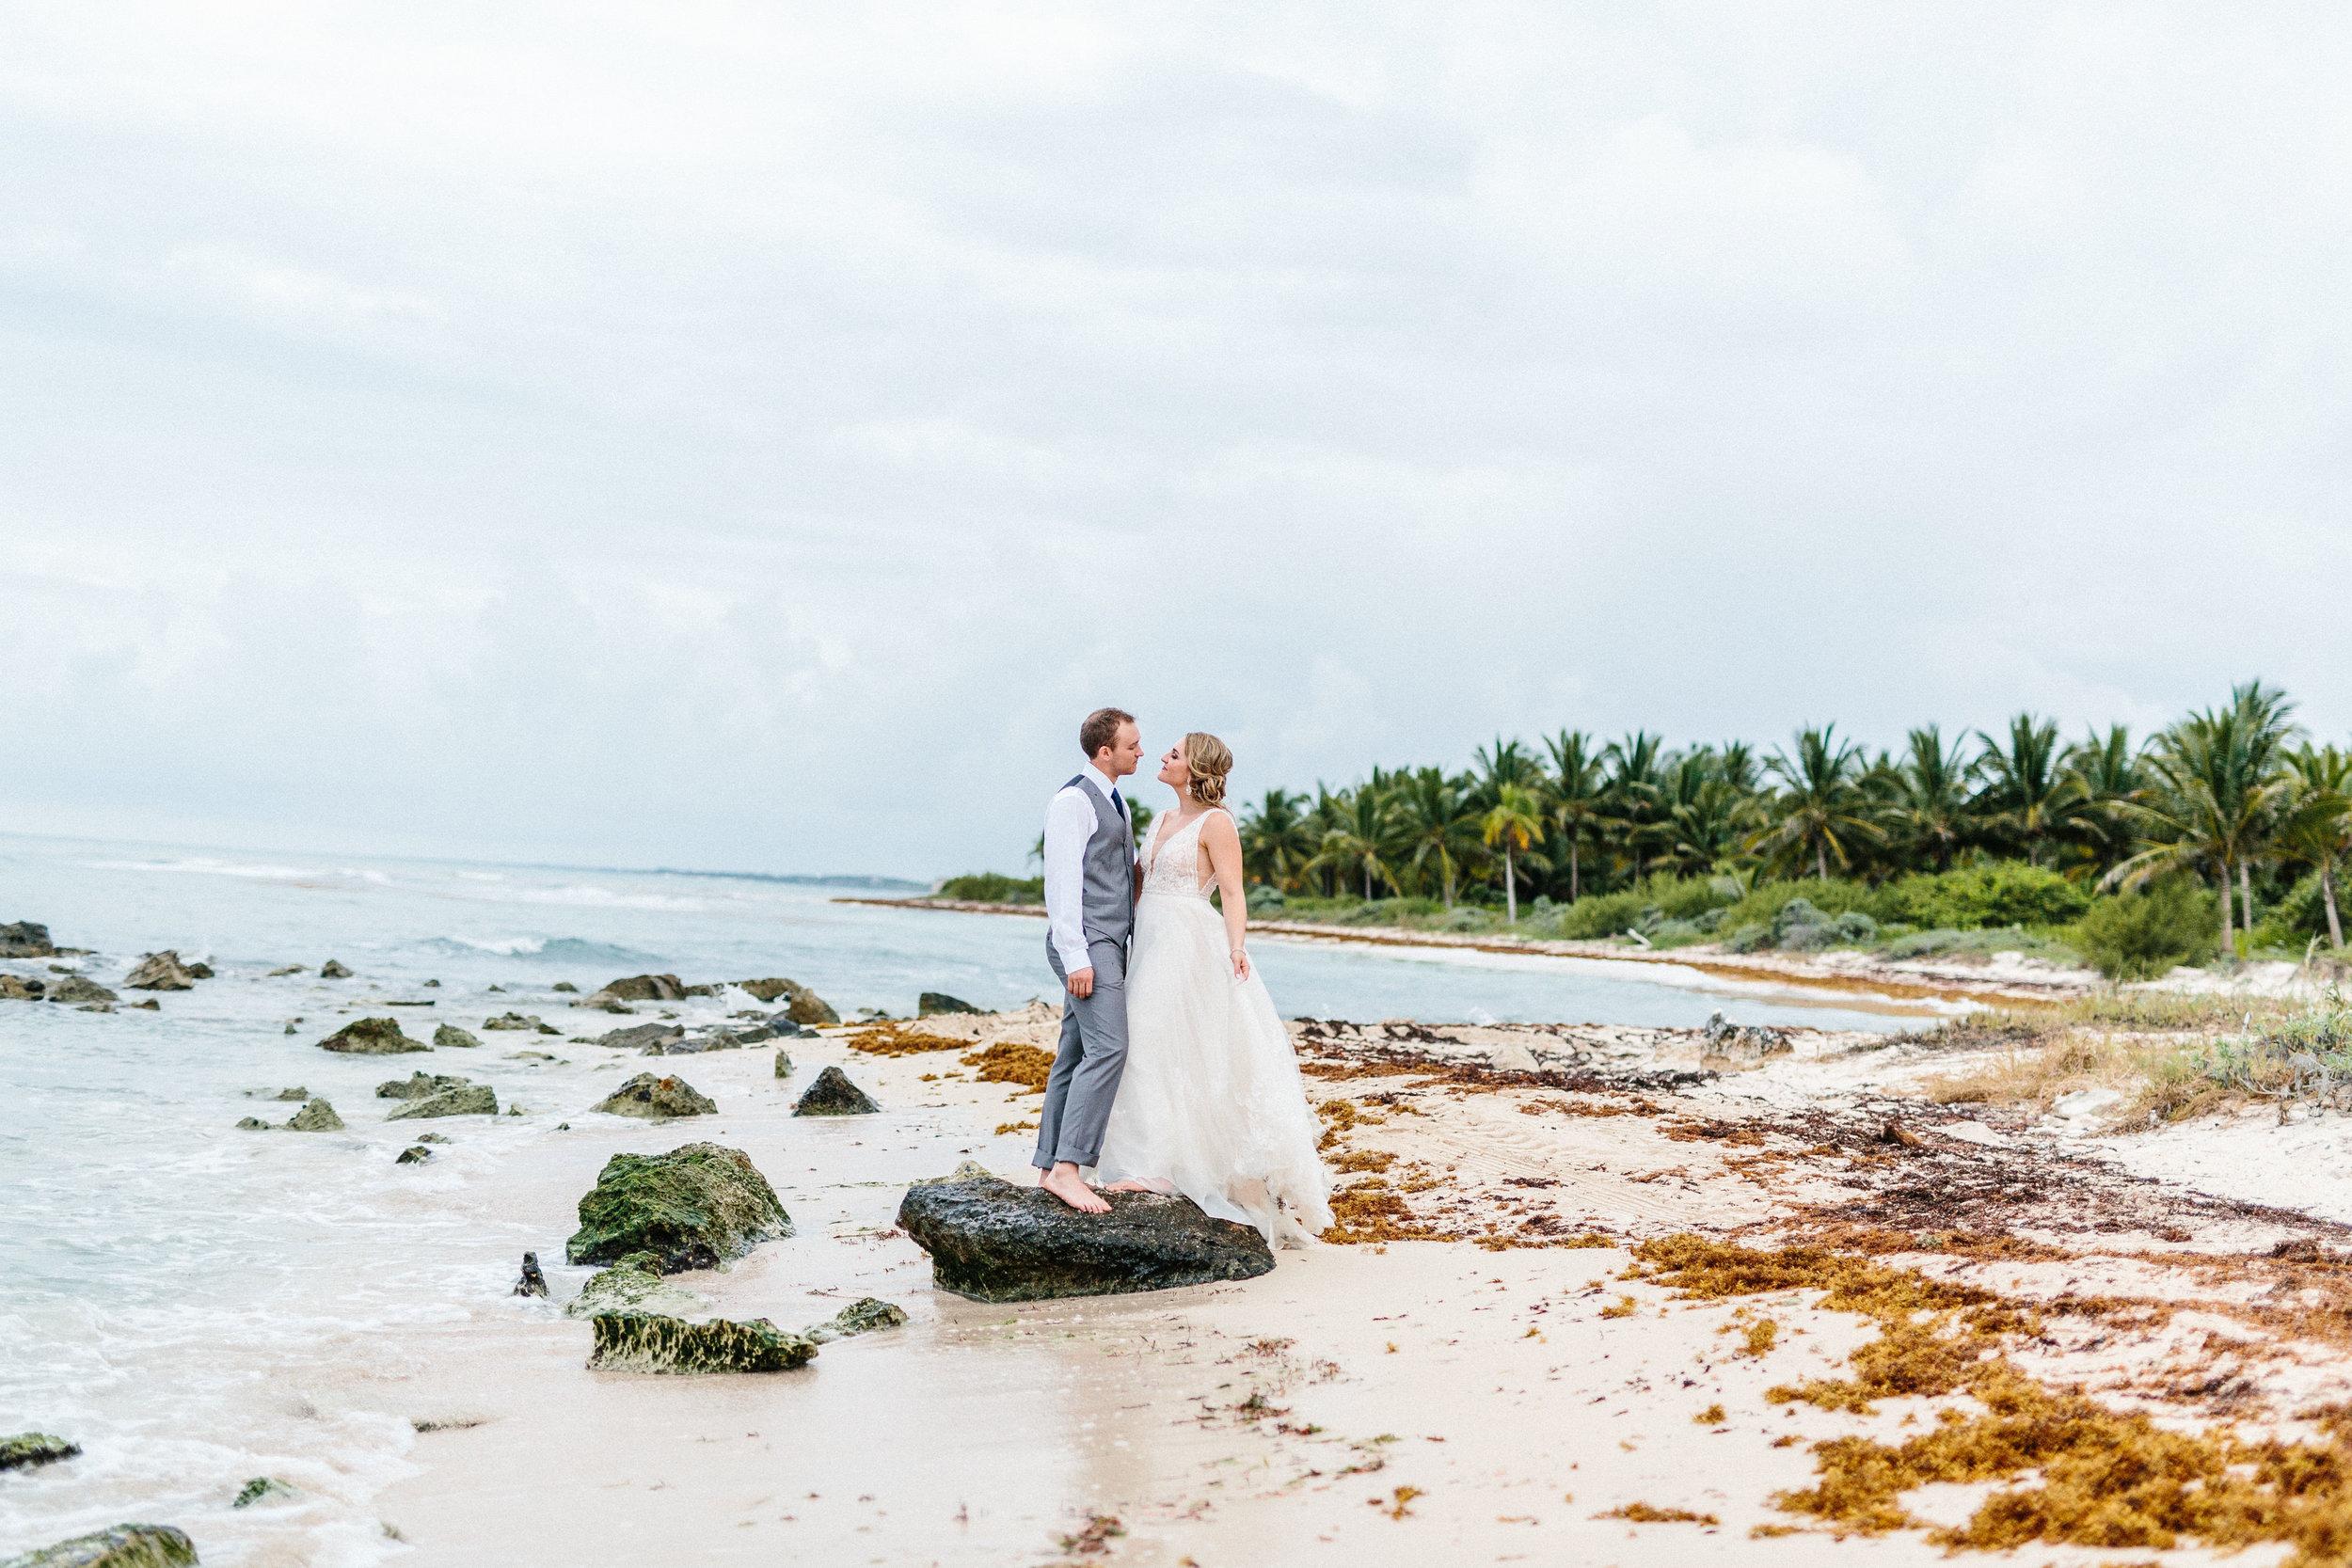 Christian + Ryan's Destination Wedding - Dreams Resort TulumPhotographer: Hannah Rose Gray Photography